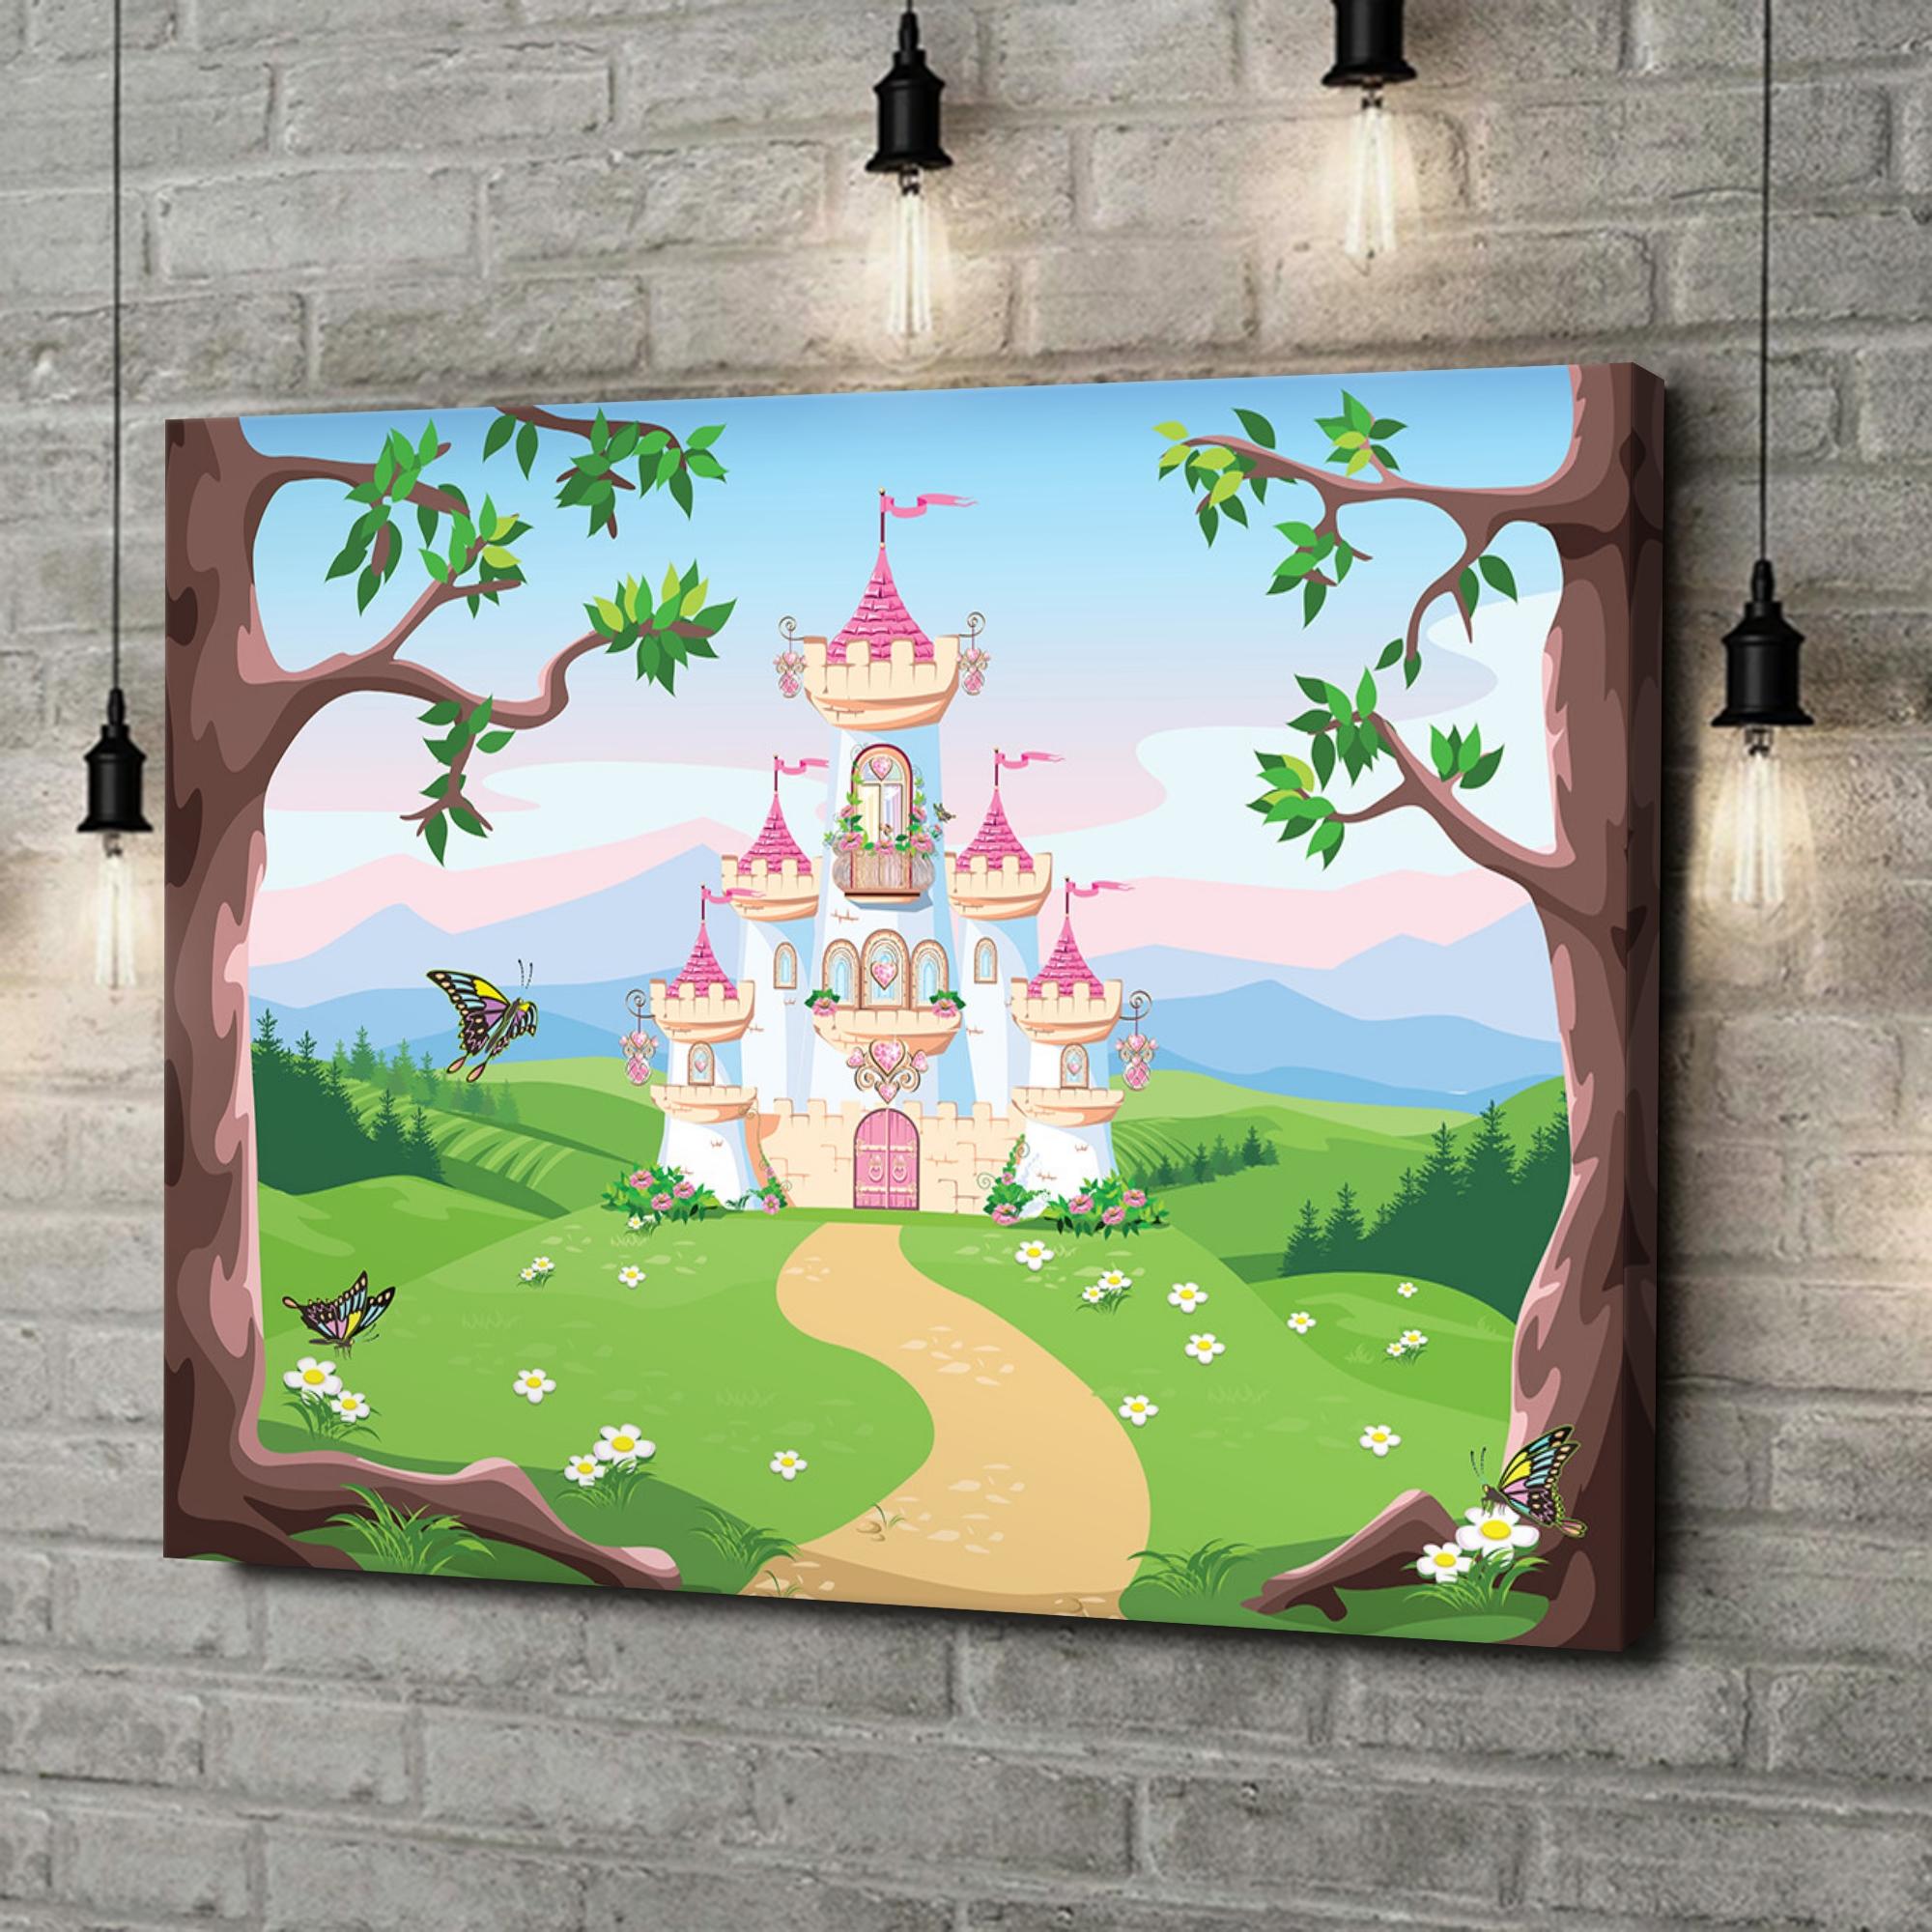 Leinwandbild personalisiert Märchenschloss